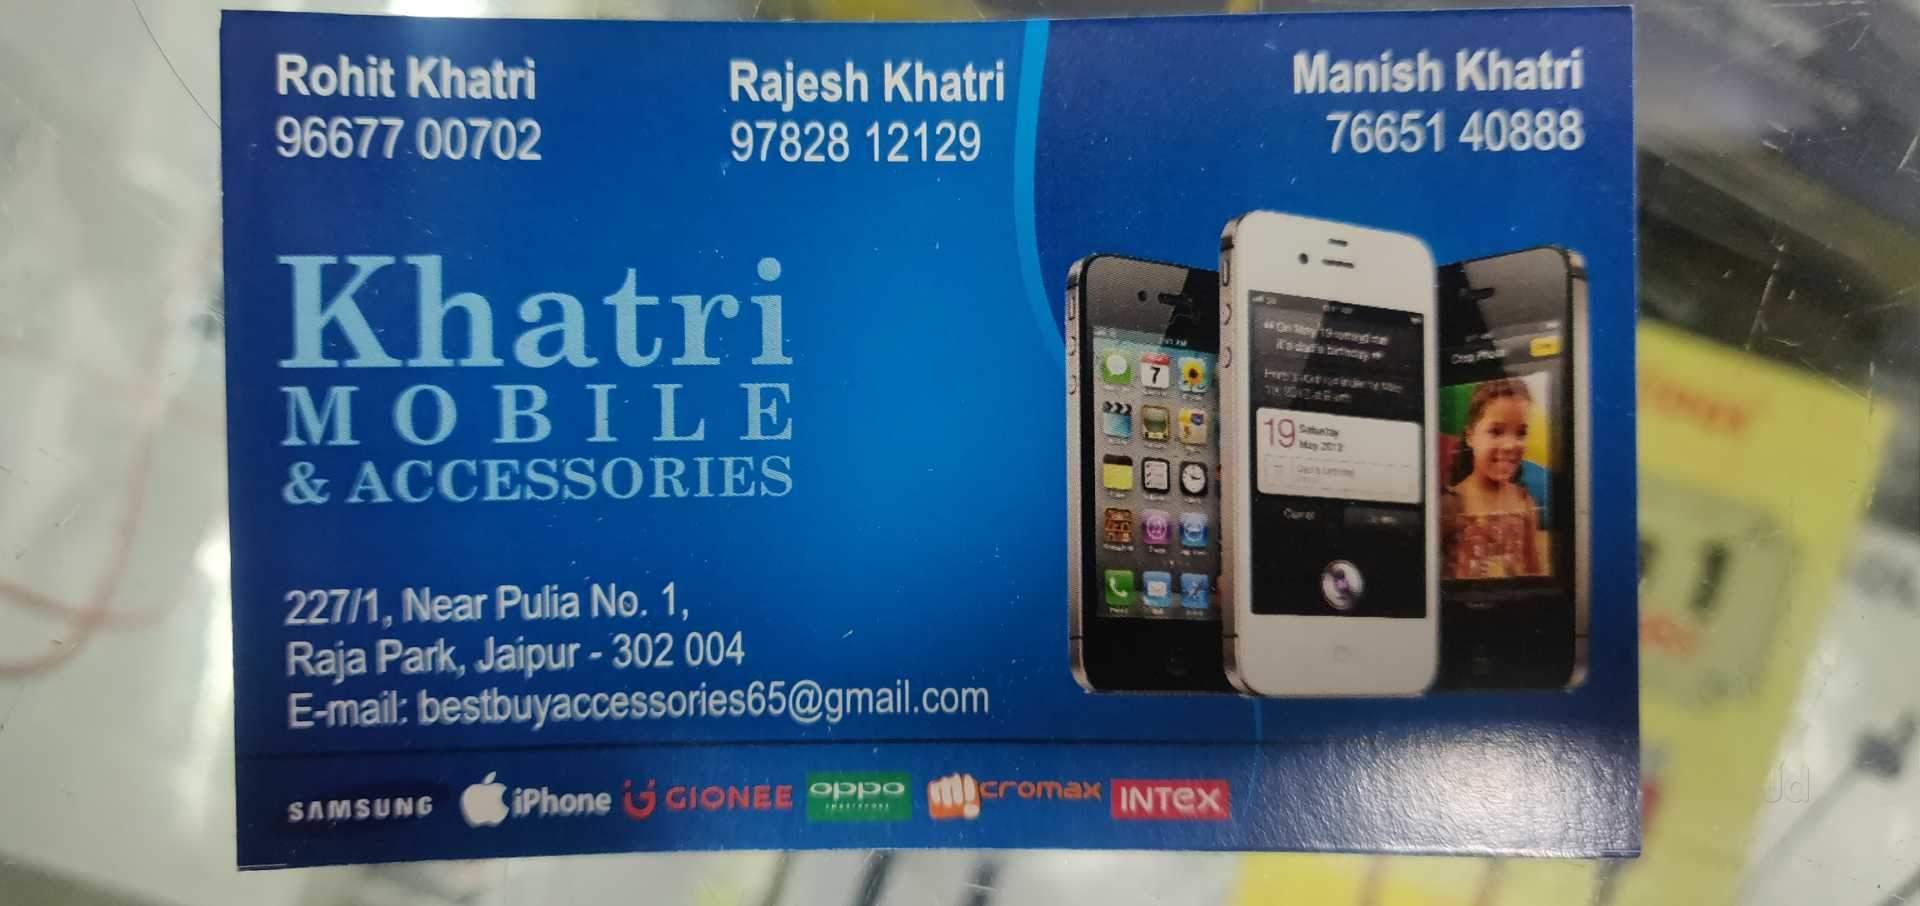 Top Bsnl Mobile Phone Simcard Dealers in Raja Park - Best Bsnl